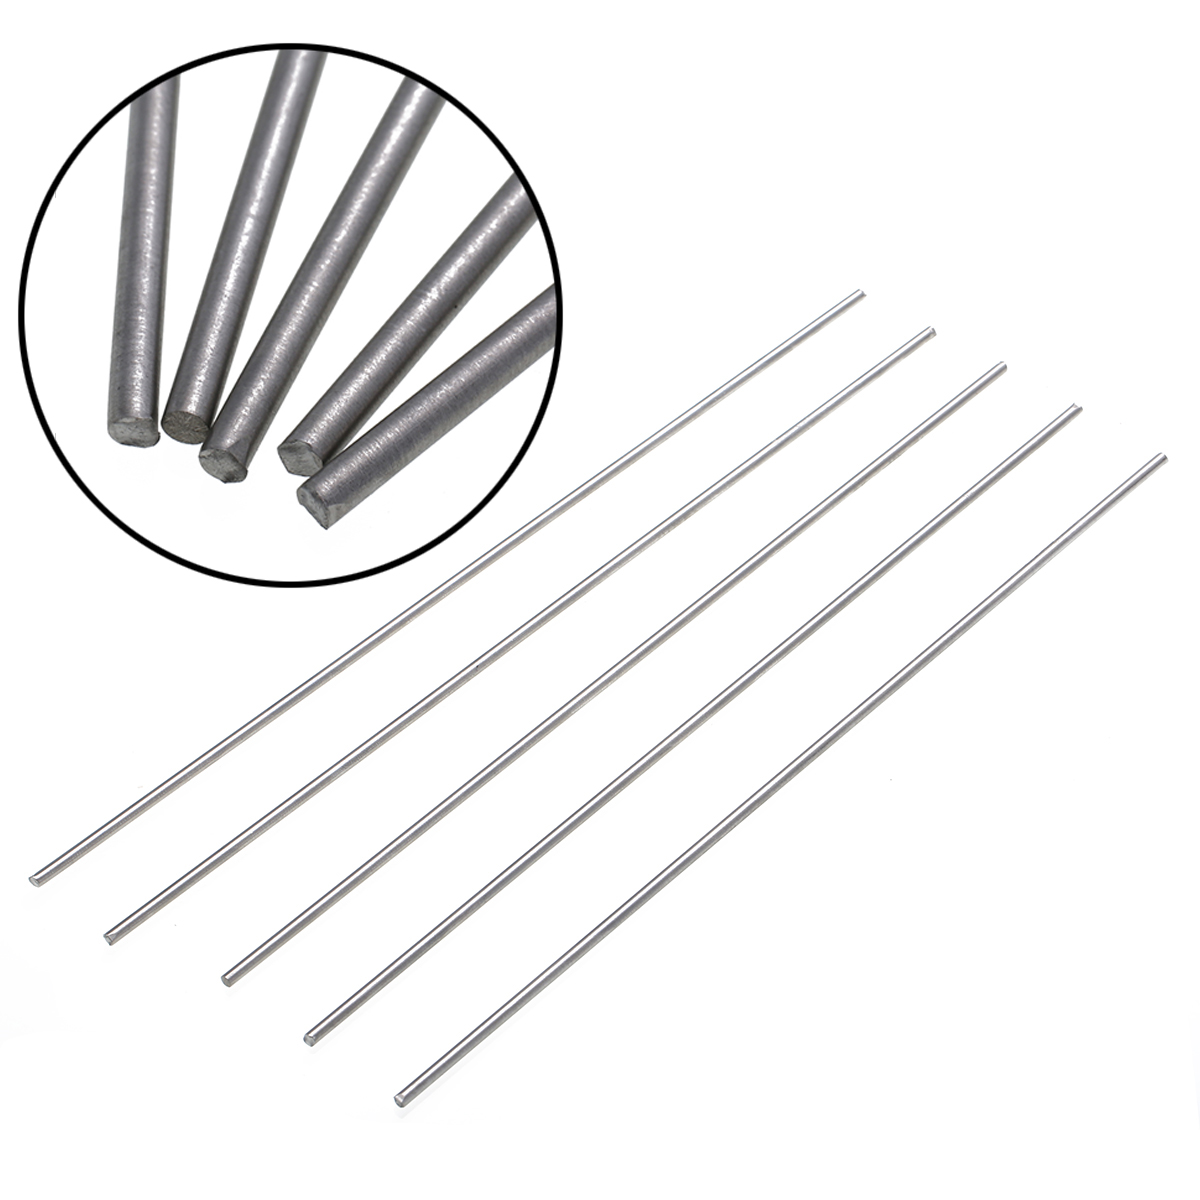 5pcs Titanium Ti Grade 5 GR5 Metal Rods Stick Bar Shaft 3mmx25cm with Corrosion Resistance qun ti xiang chaozhou feng huang dan cong oolong 100g 3 5 oz